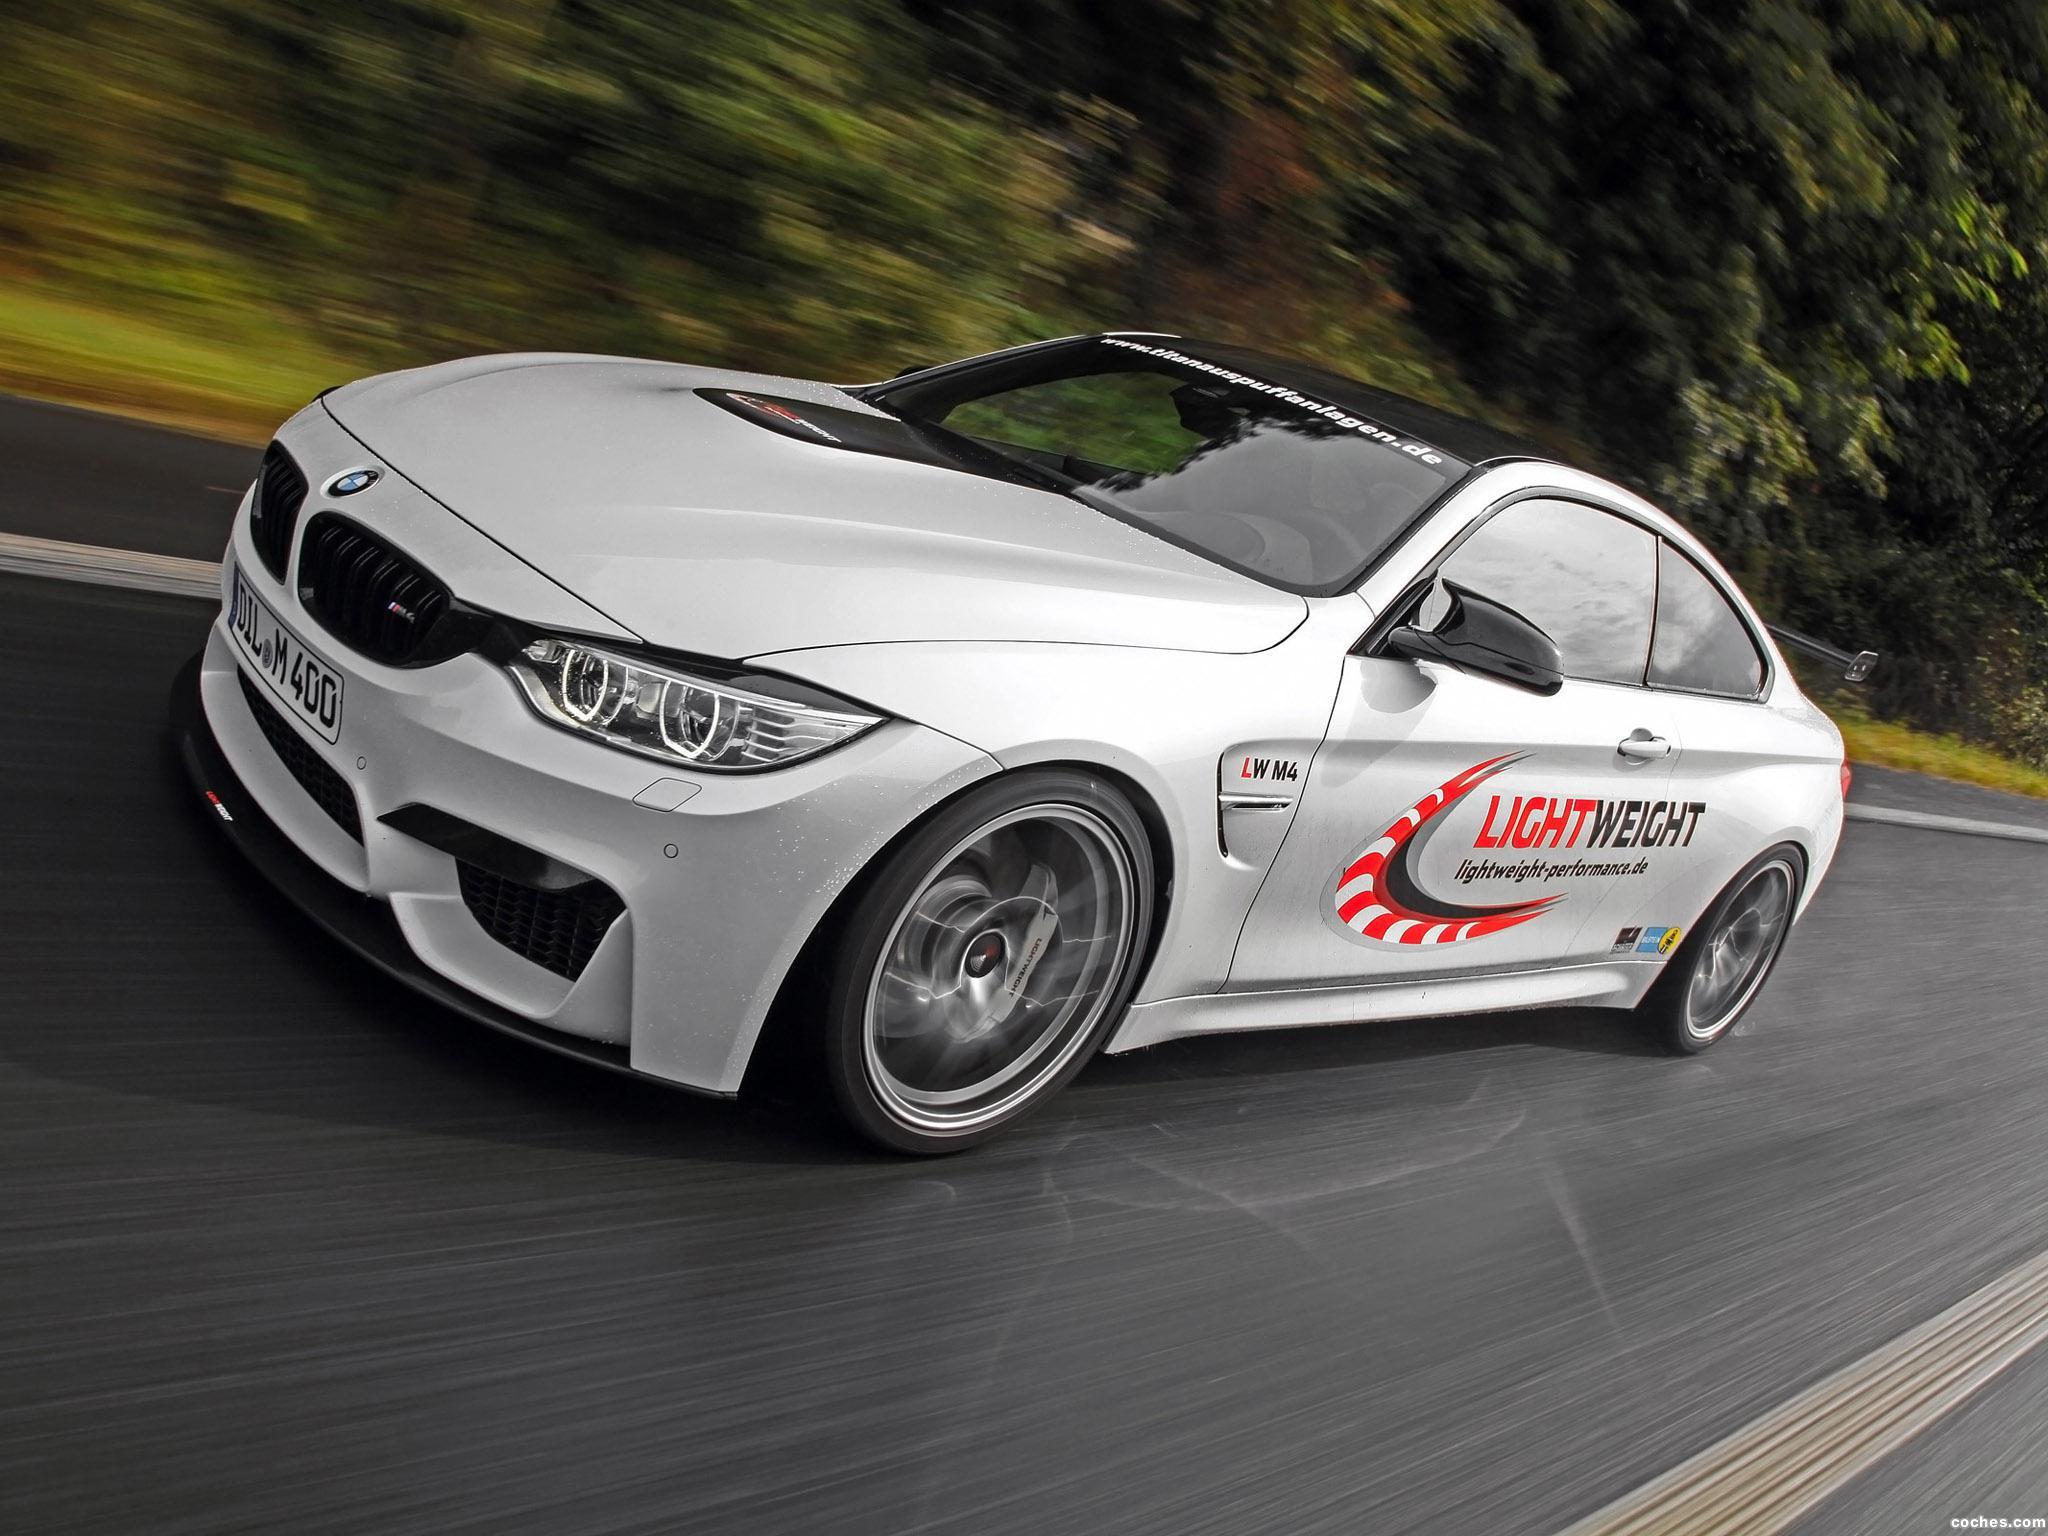 Foto 13 de BMW M4 LightWeight LW 2014